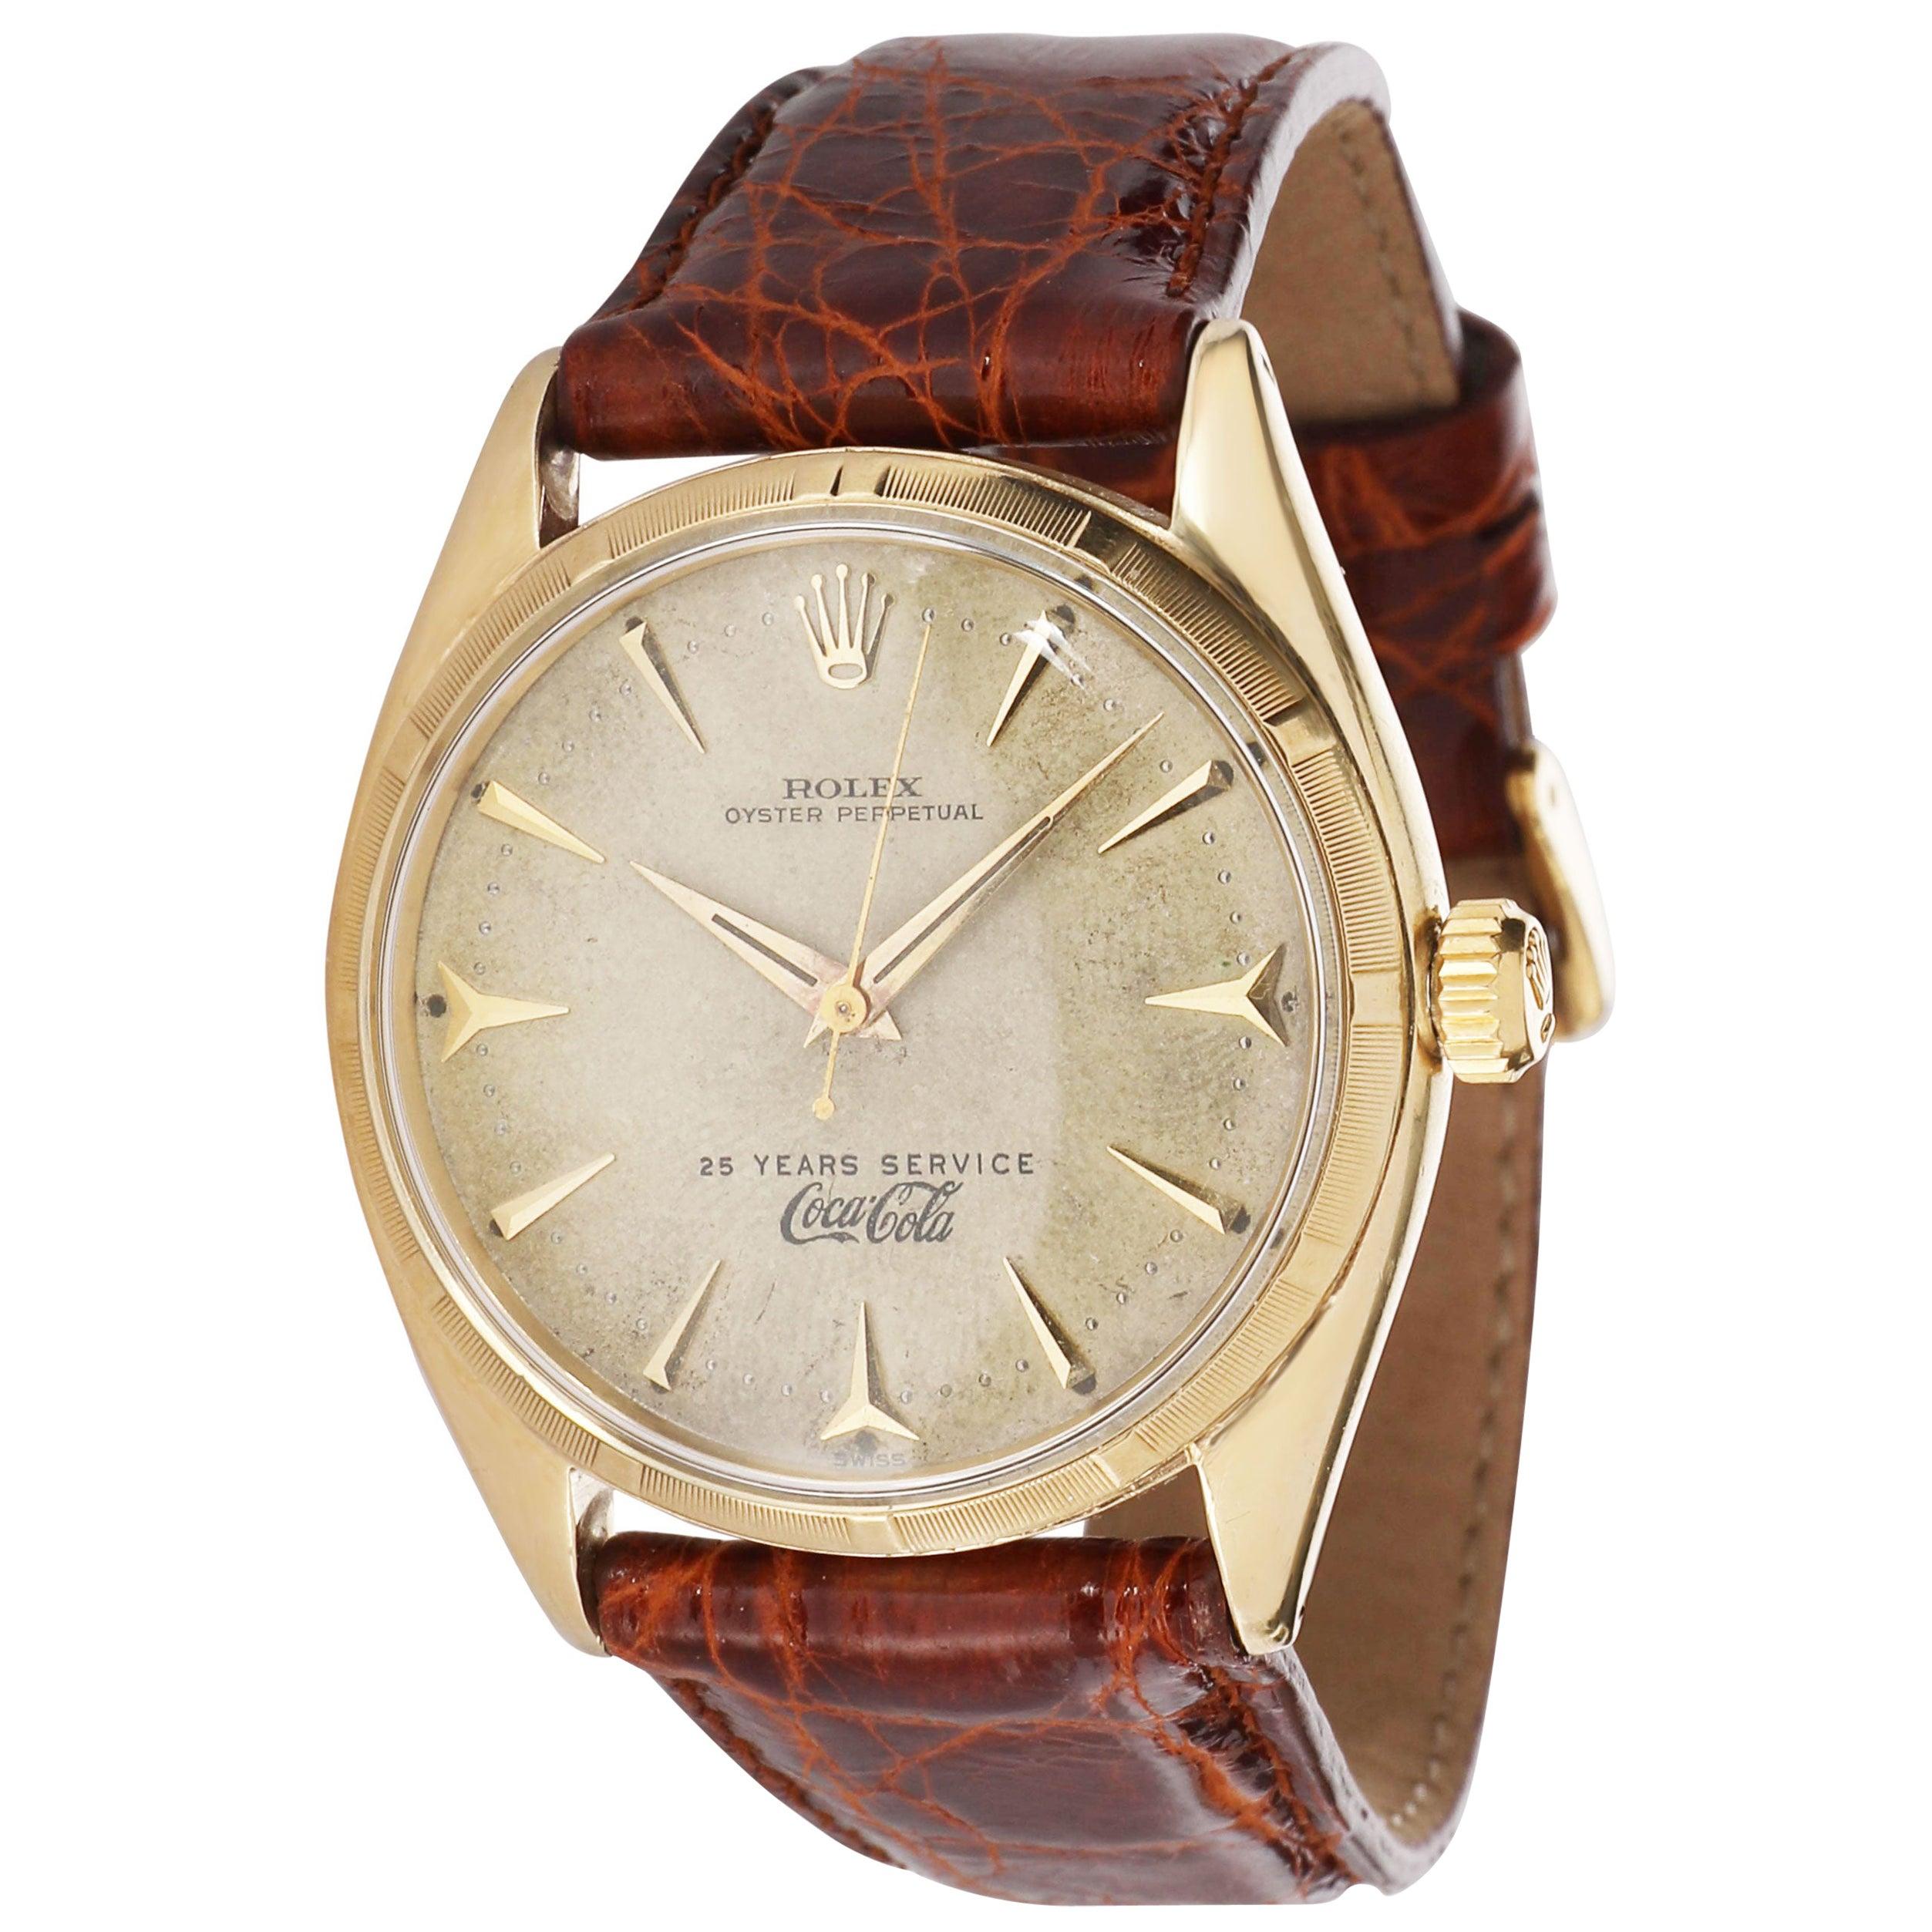 Rolex Oyster Perpetual 6565 Men's Watch in 14 Karat Yellow Gold